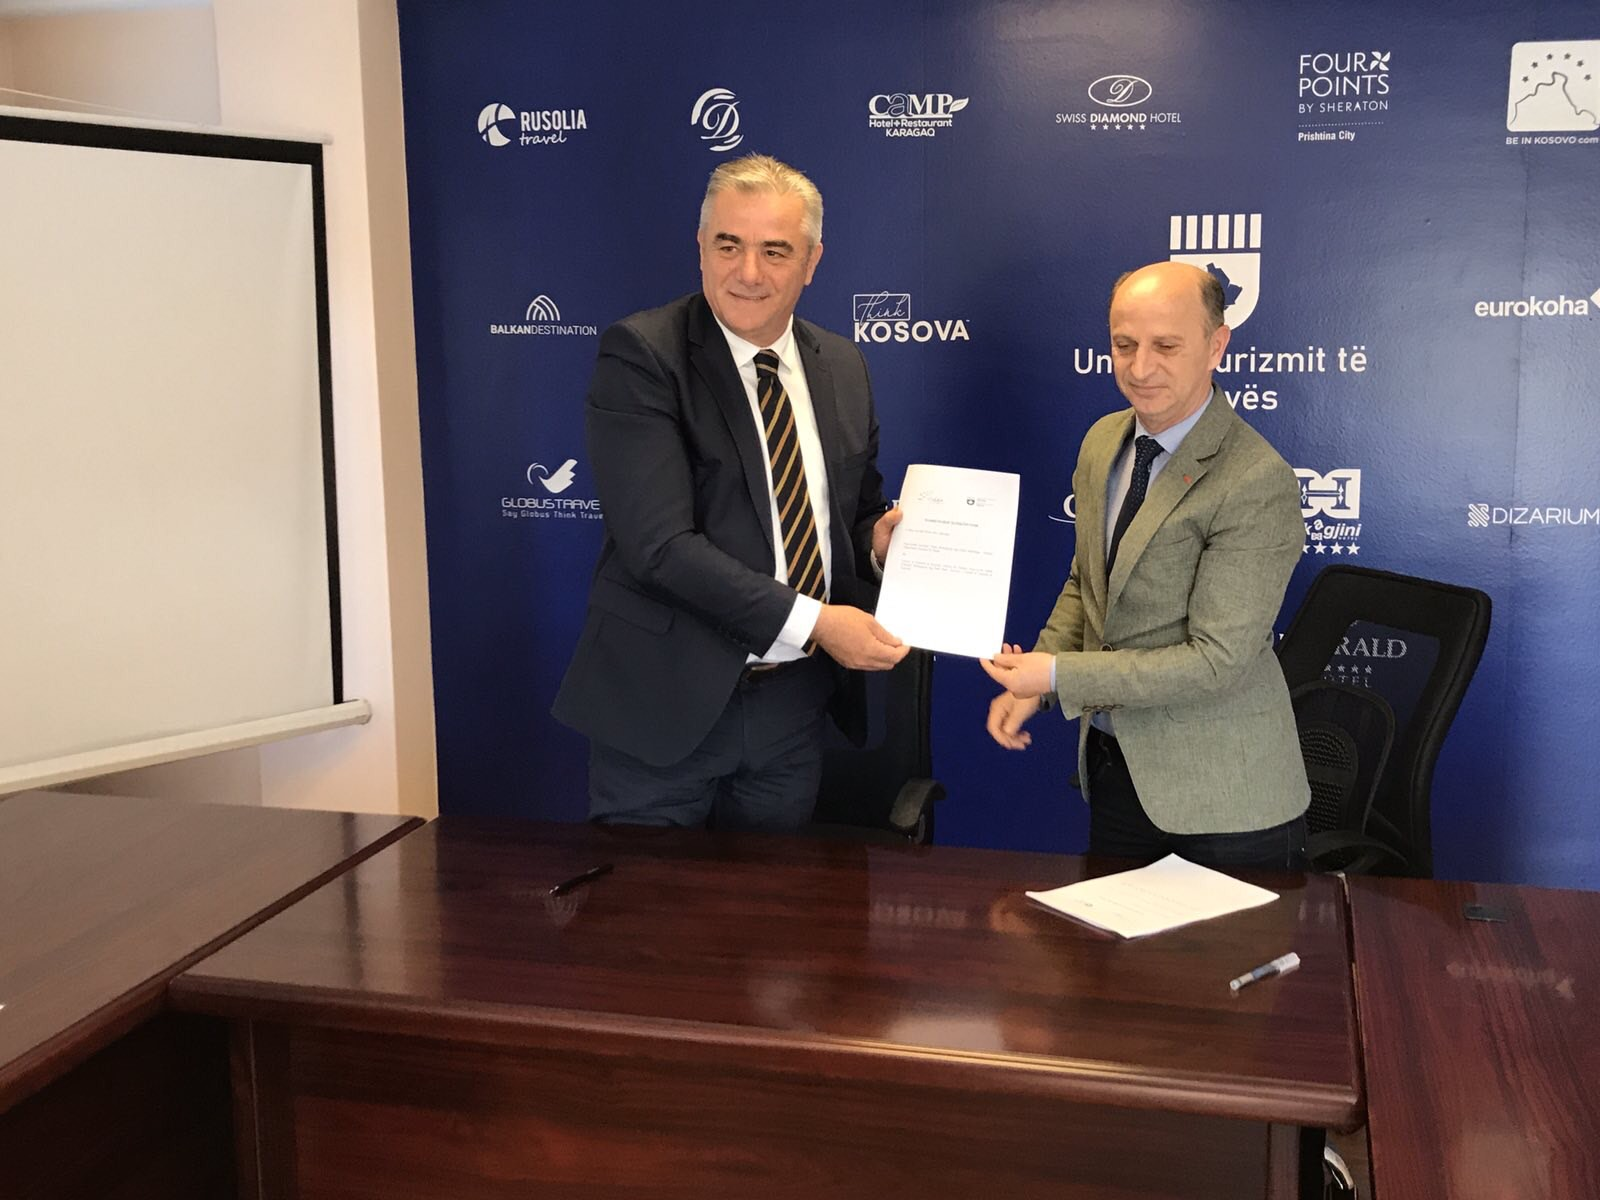 Ne kuader te qendrimit ne Kosove me qellim te prezentimit te ofertes turistike te vitit 2021 per Ulqinin